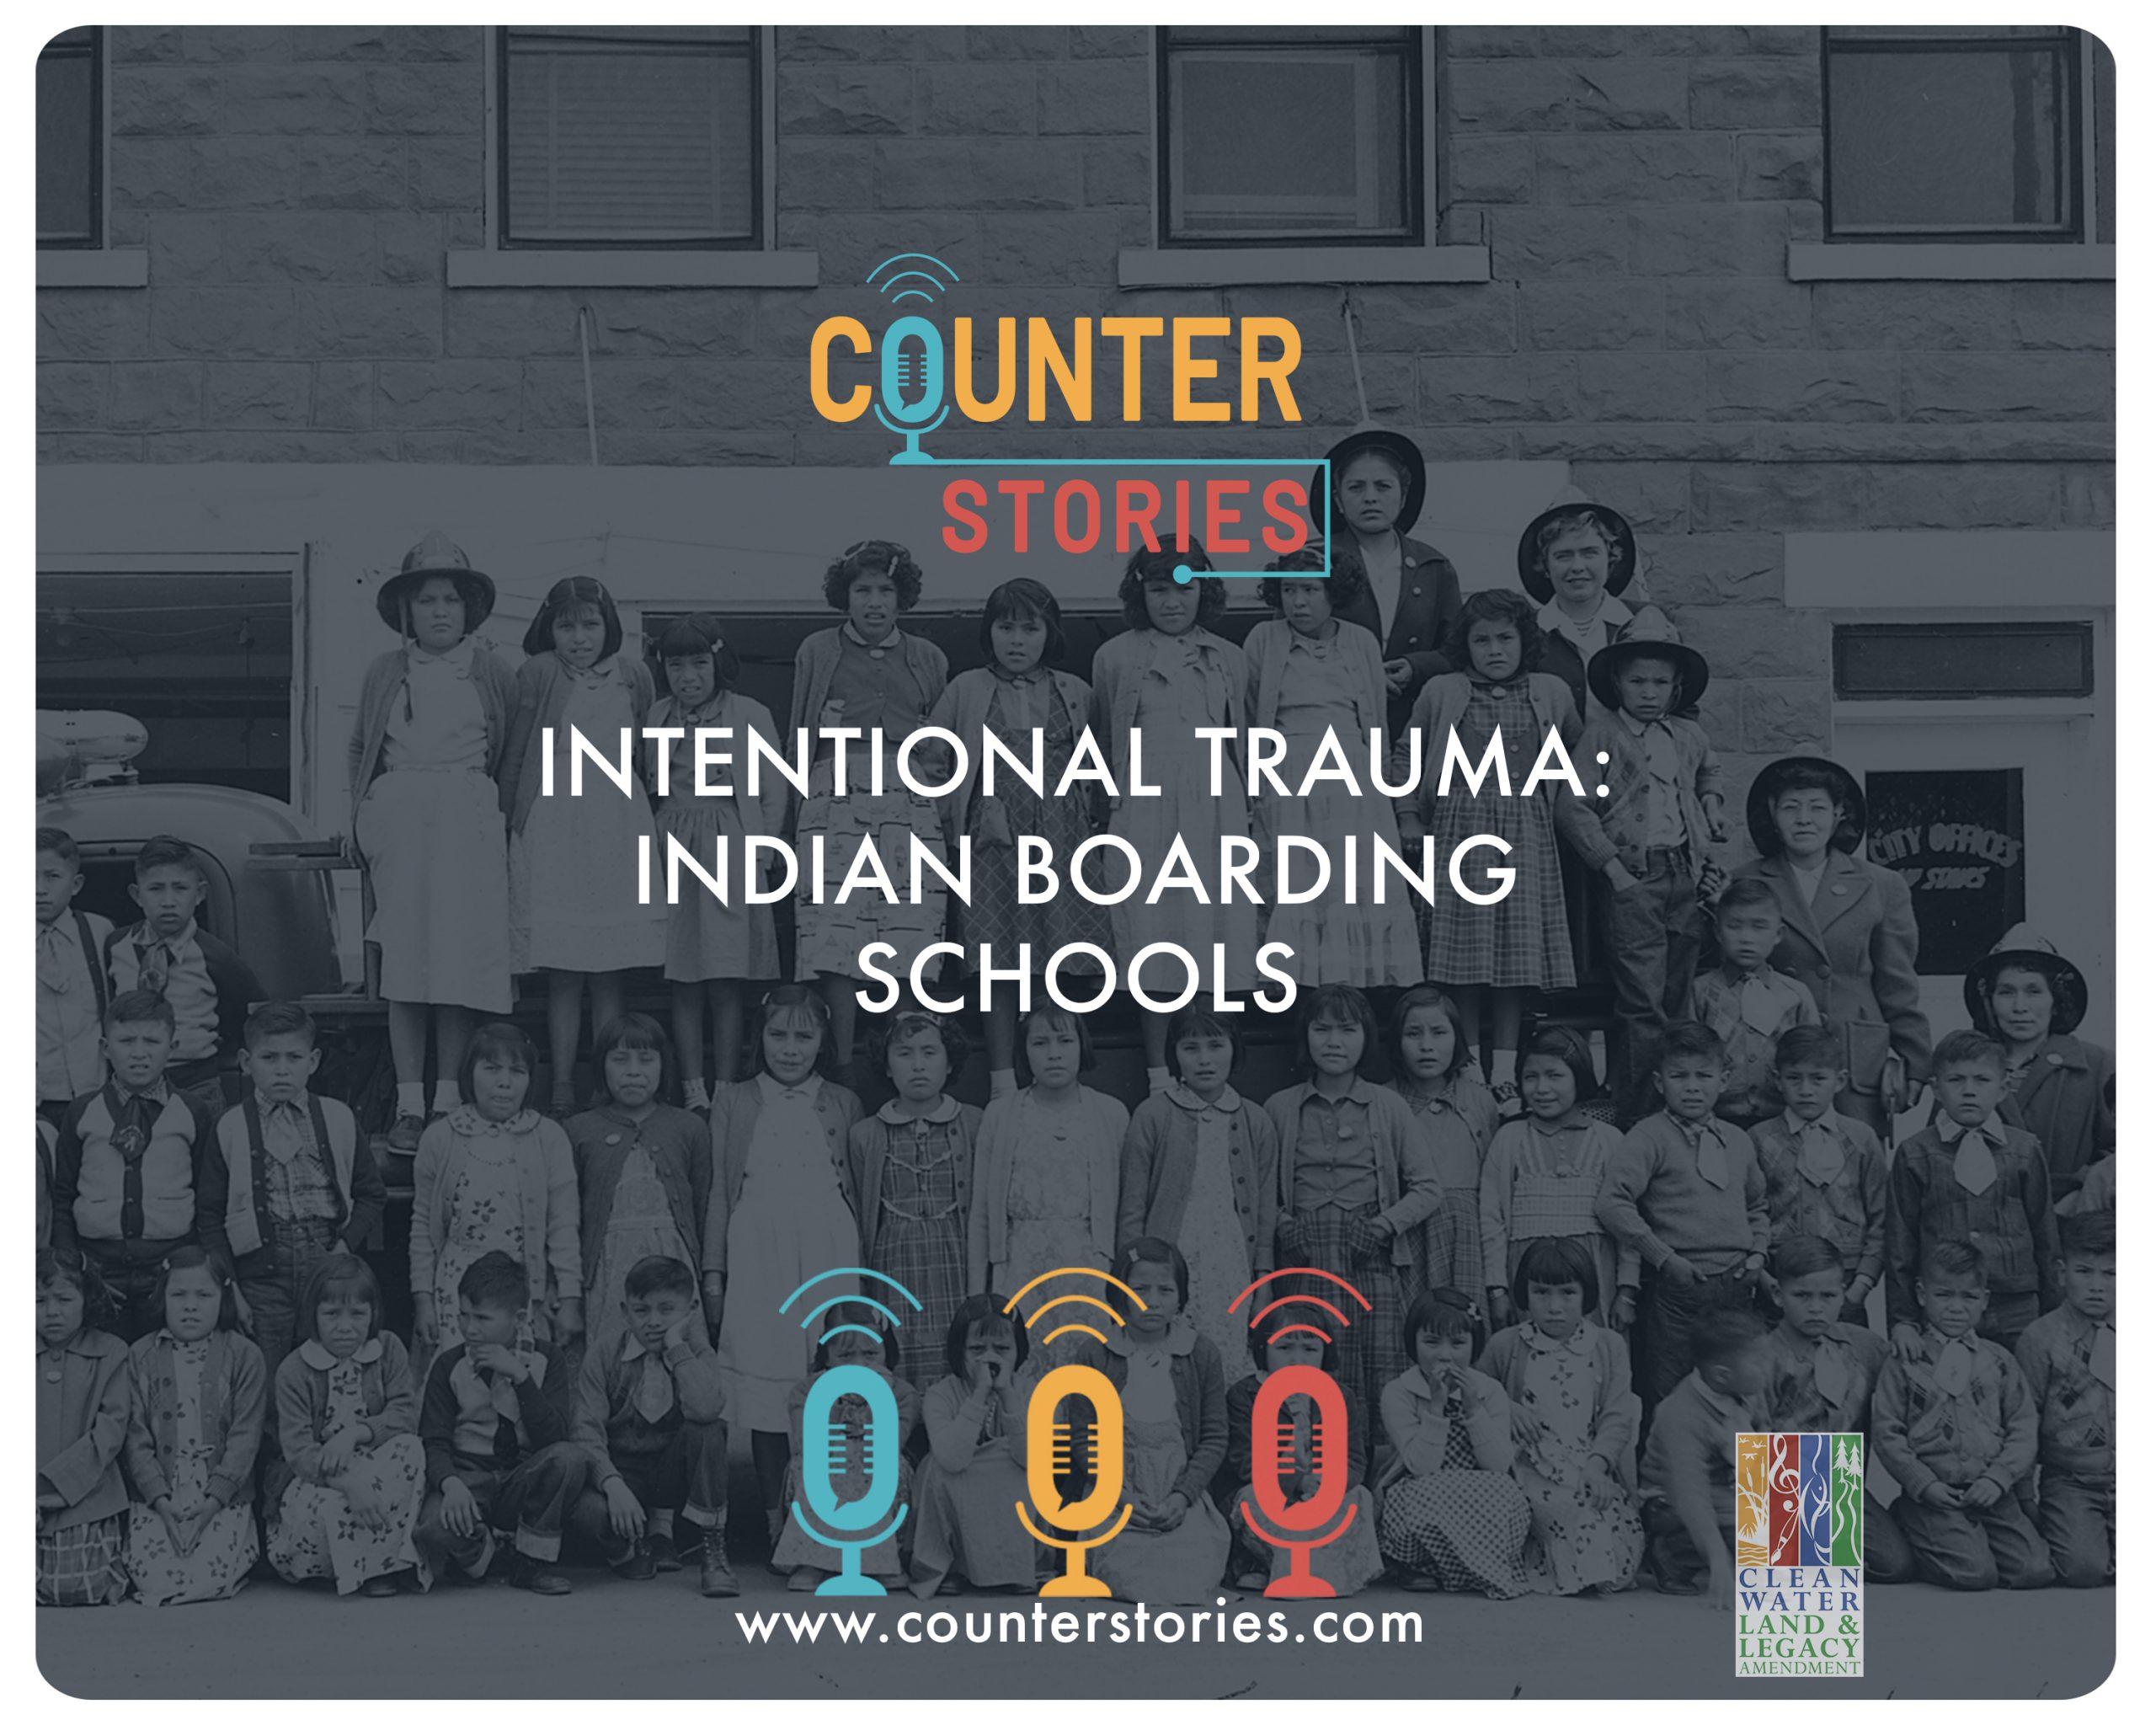 Intentional Trauma: Indian Boarding Schools